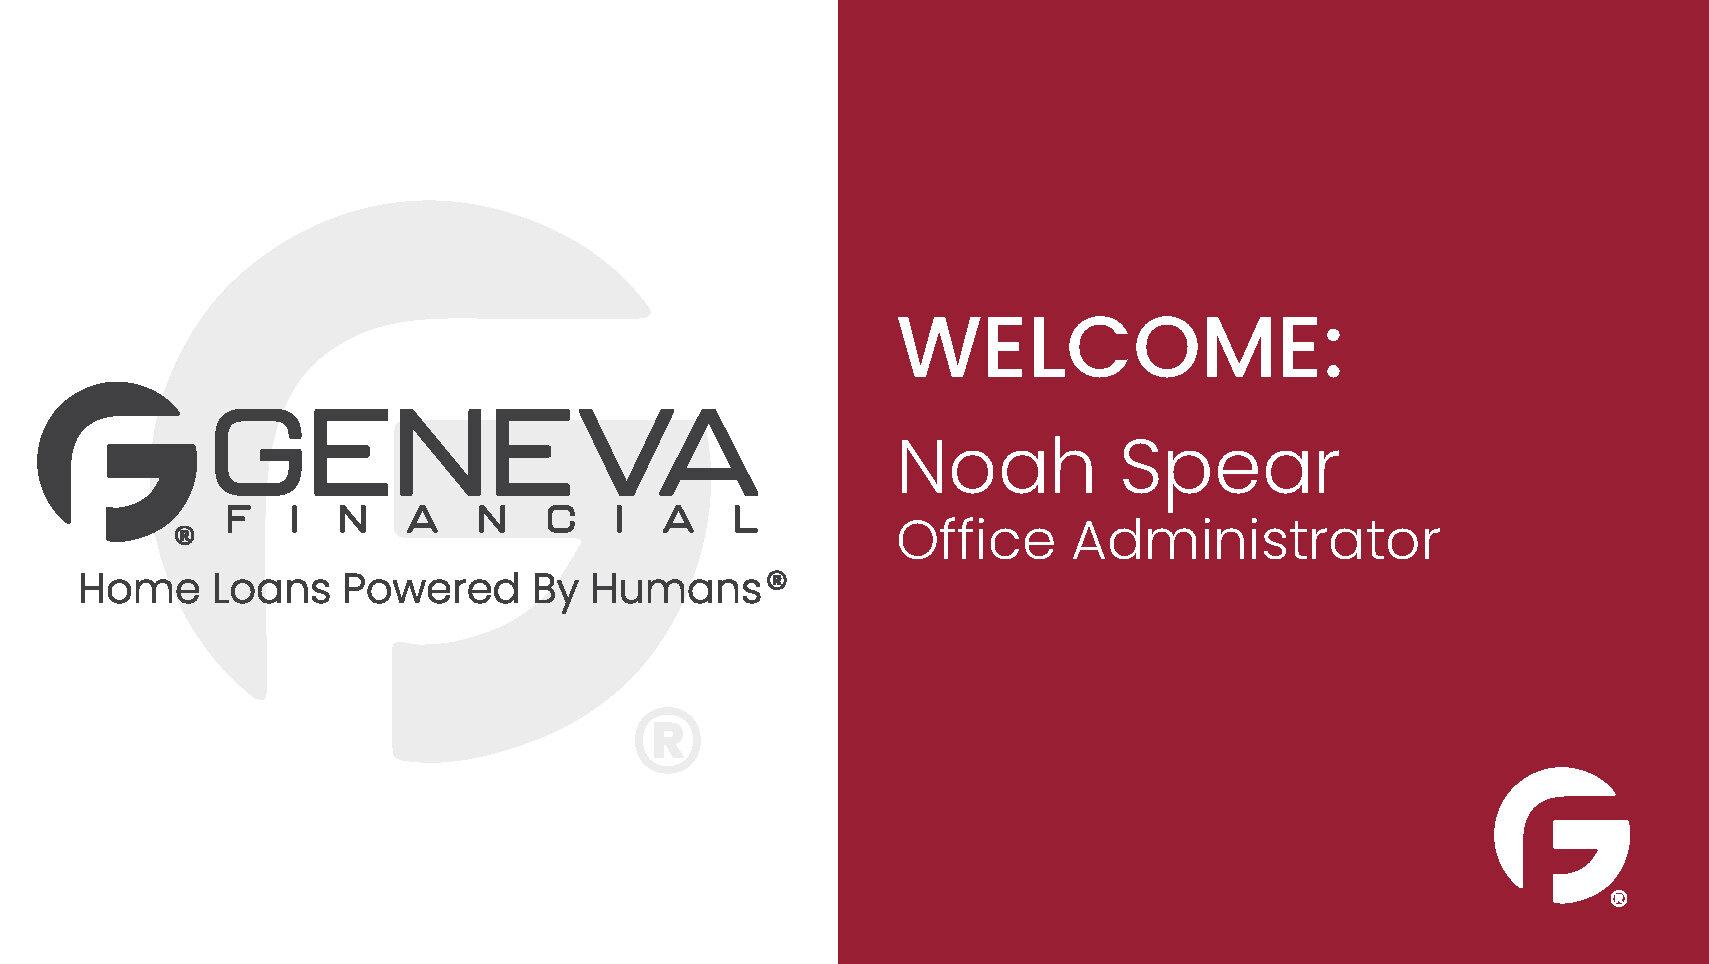 Noah Spear, Office Administrator